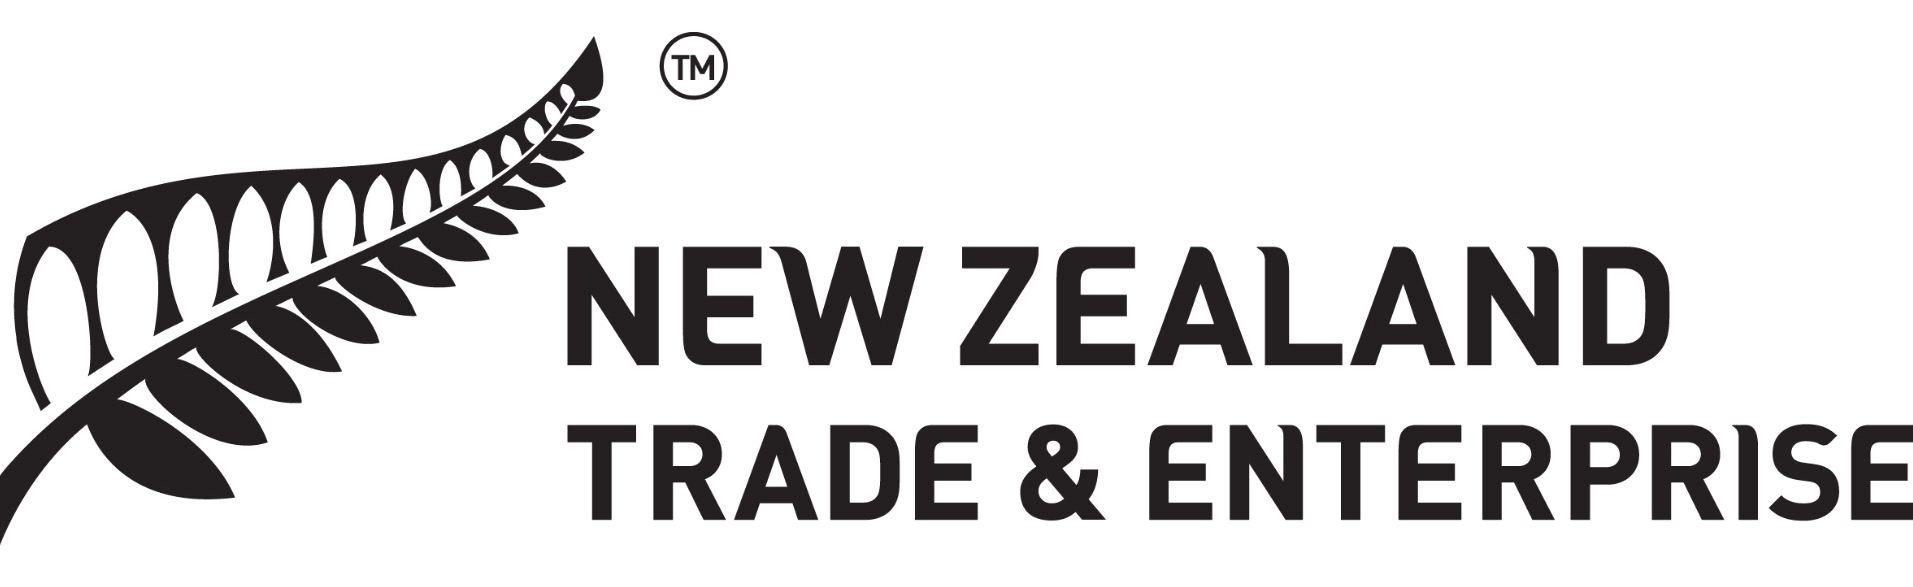 New Zealand Trade & Enterprise